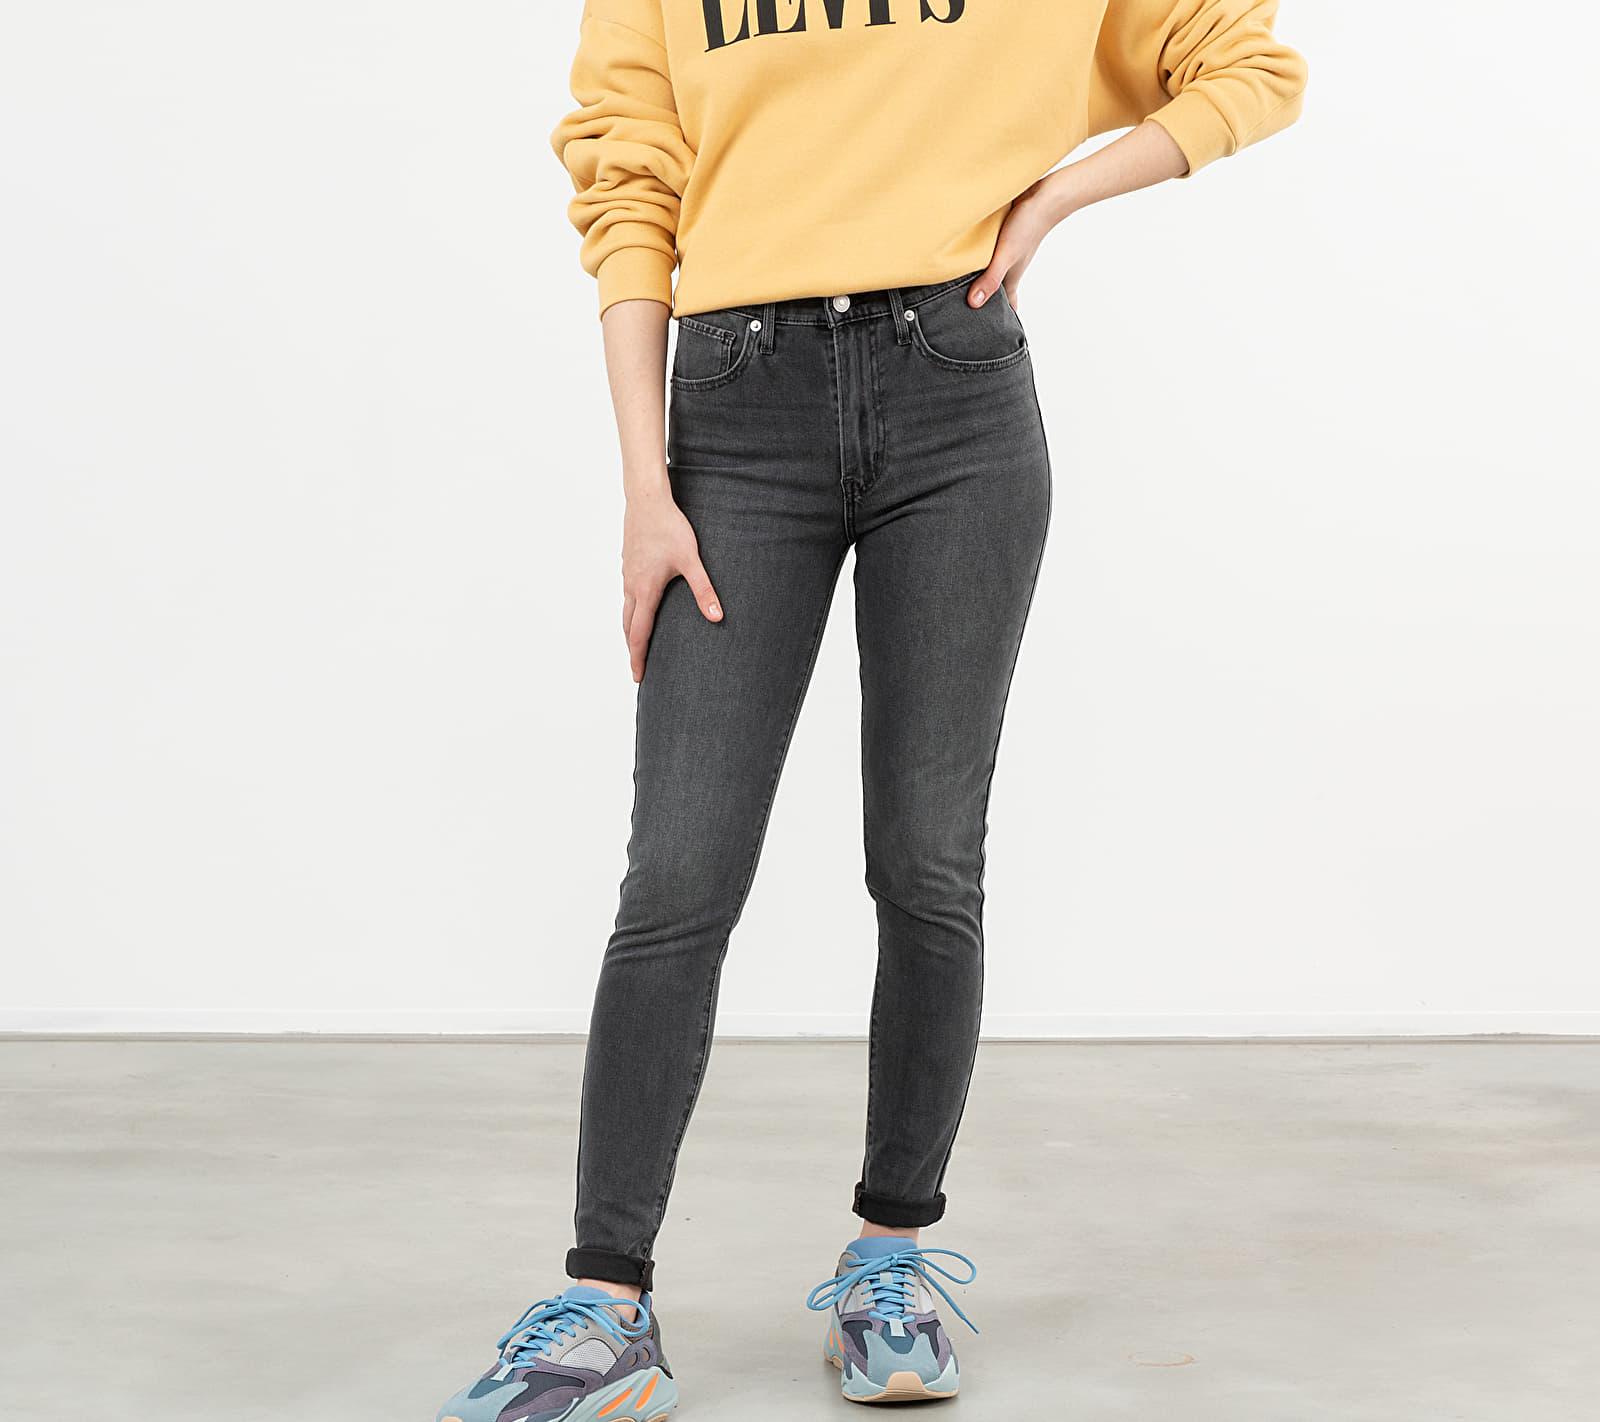 Levi's Mile High Super Skinny Jeans Smoke Show, Gray